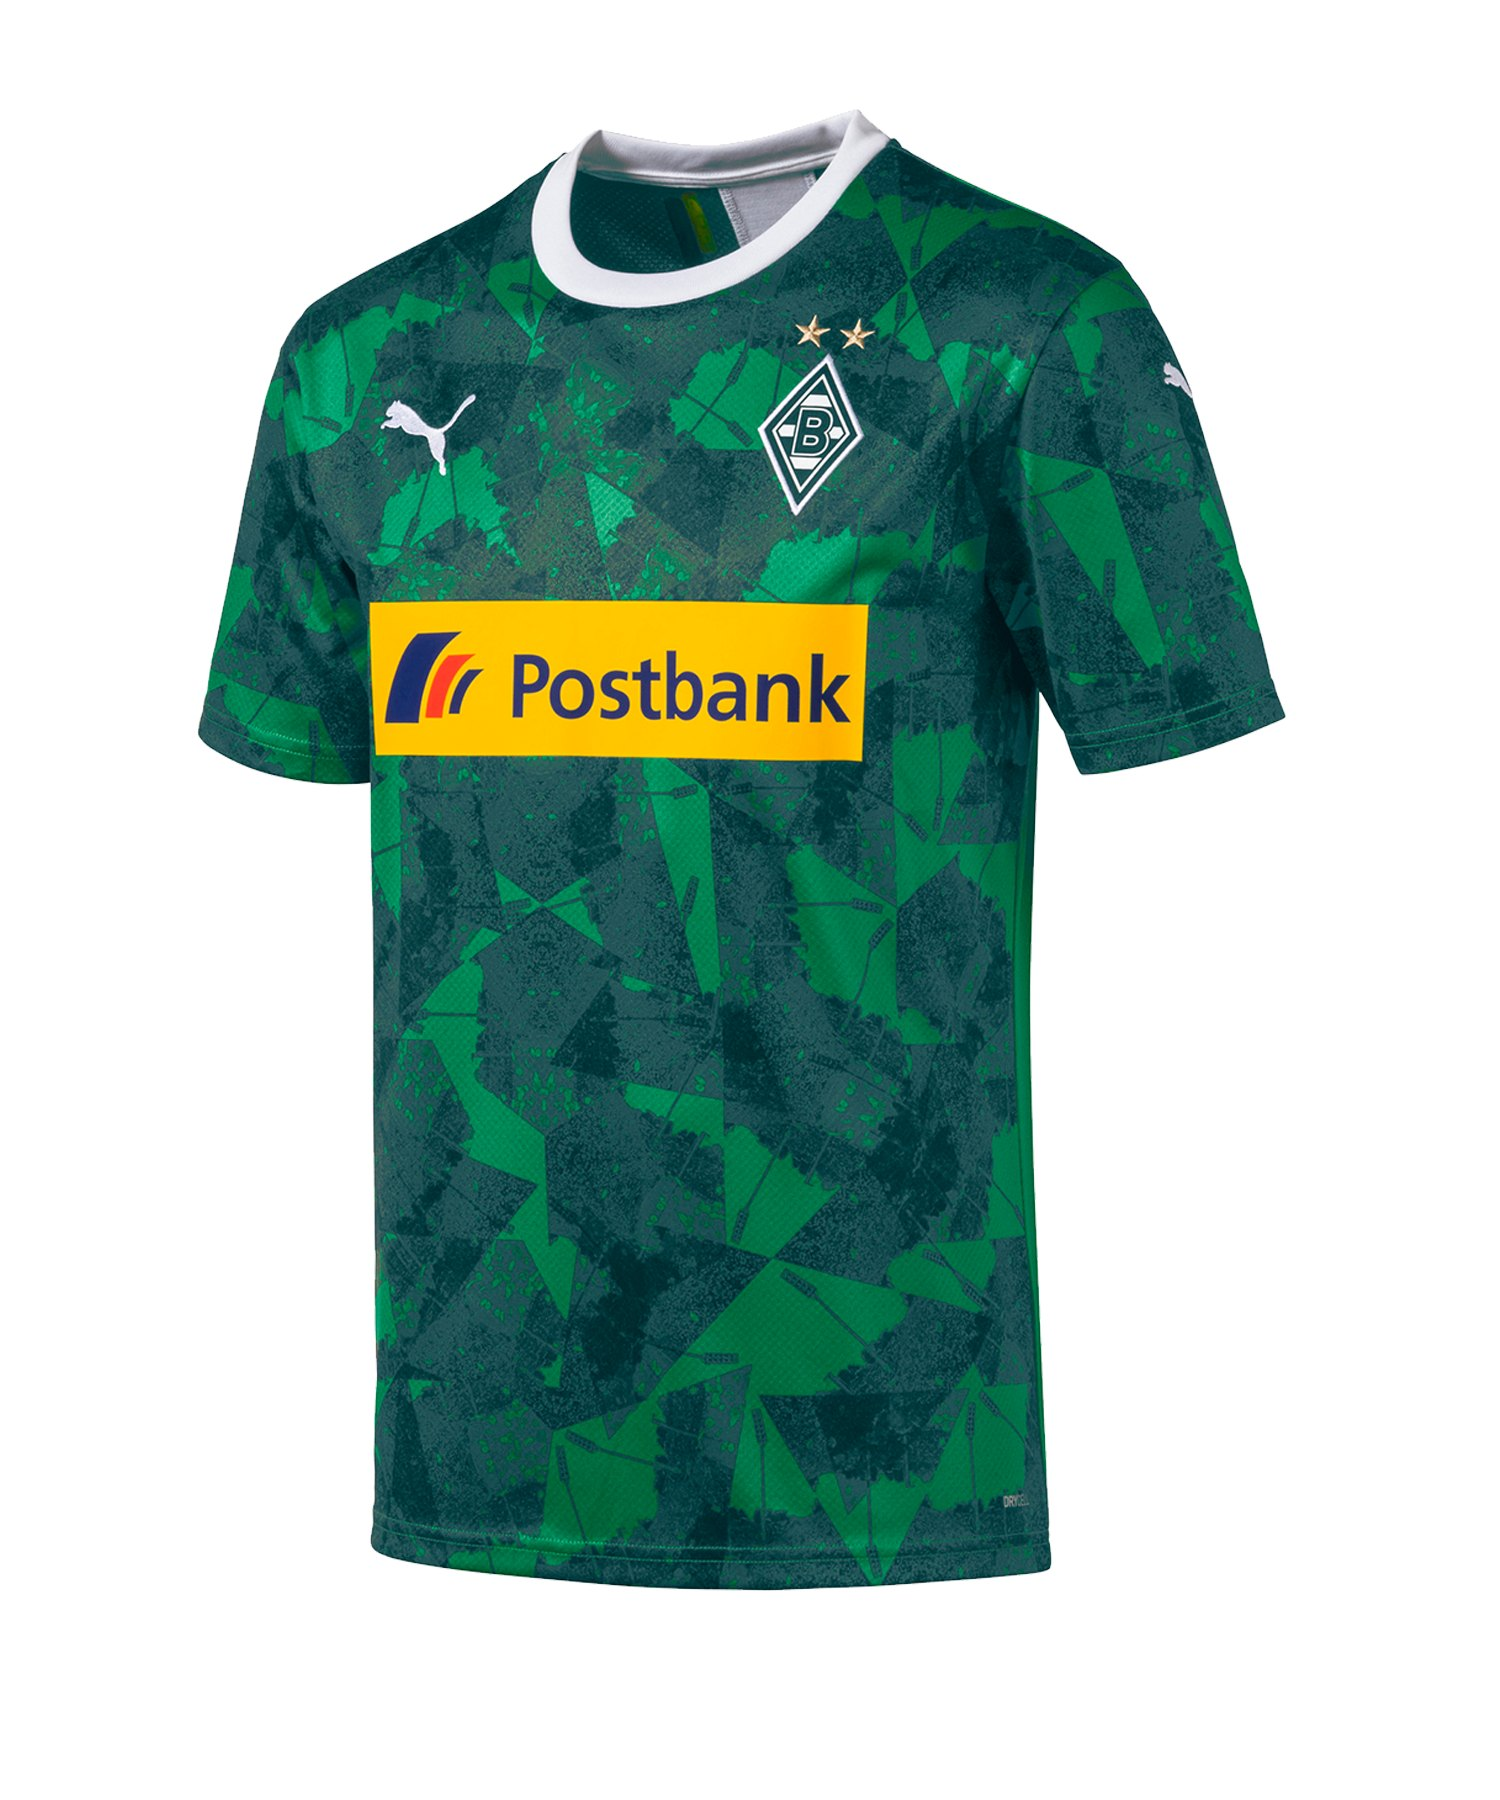 PUMA Borussia Mönchengladbach Trikot 3rd 2019/2020 F02 - Grün